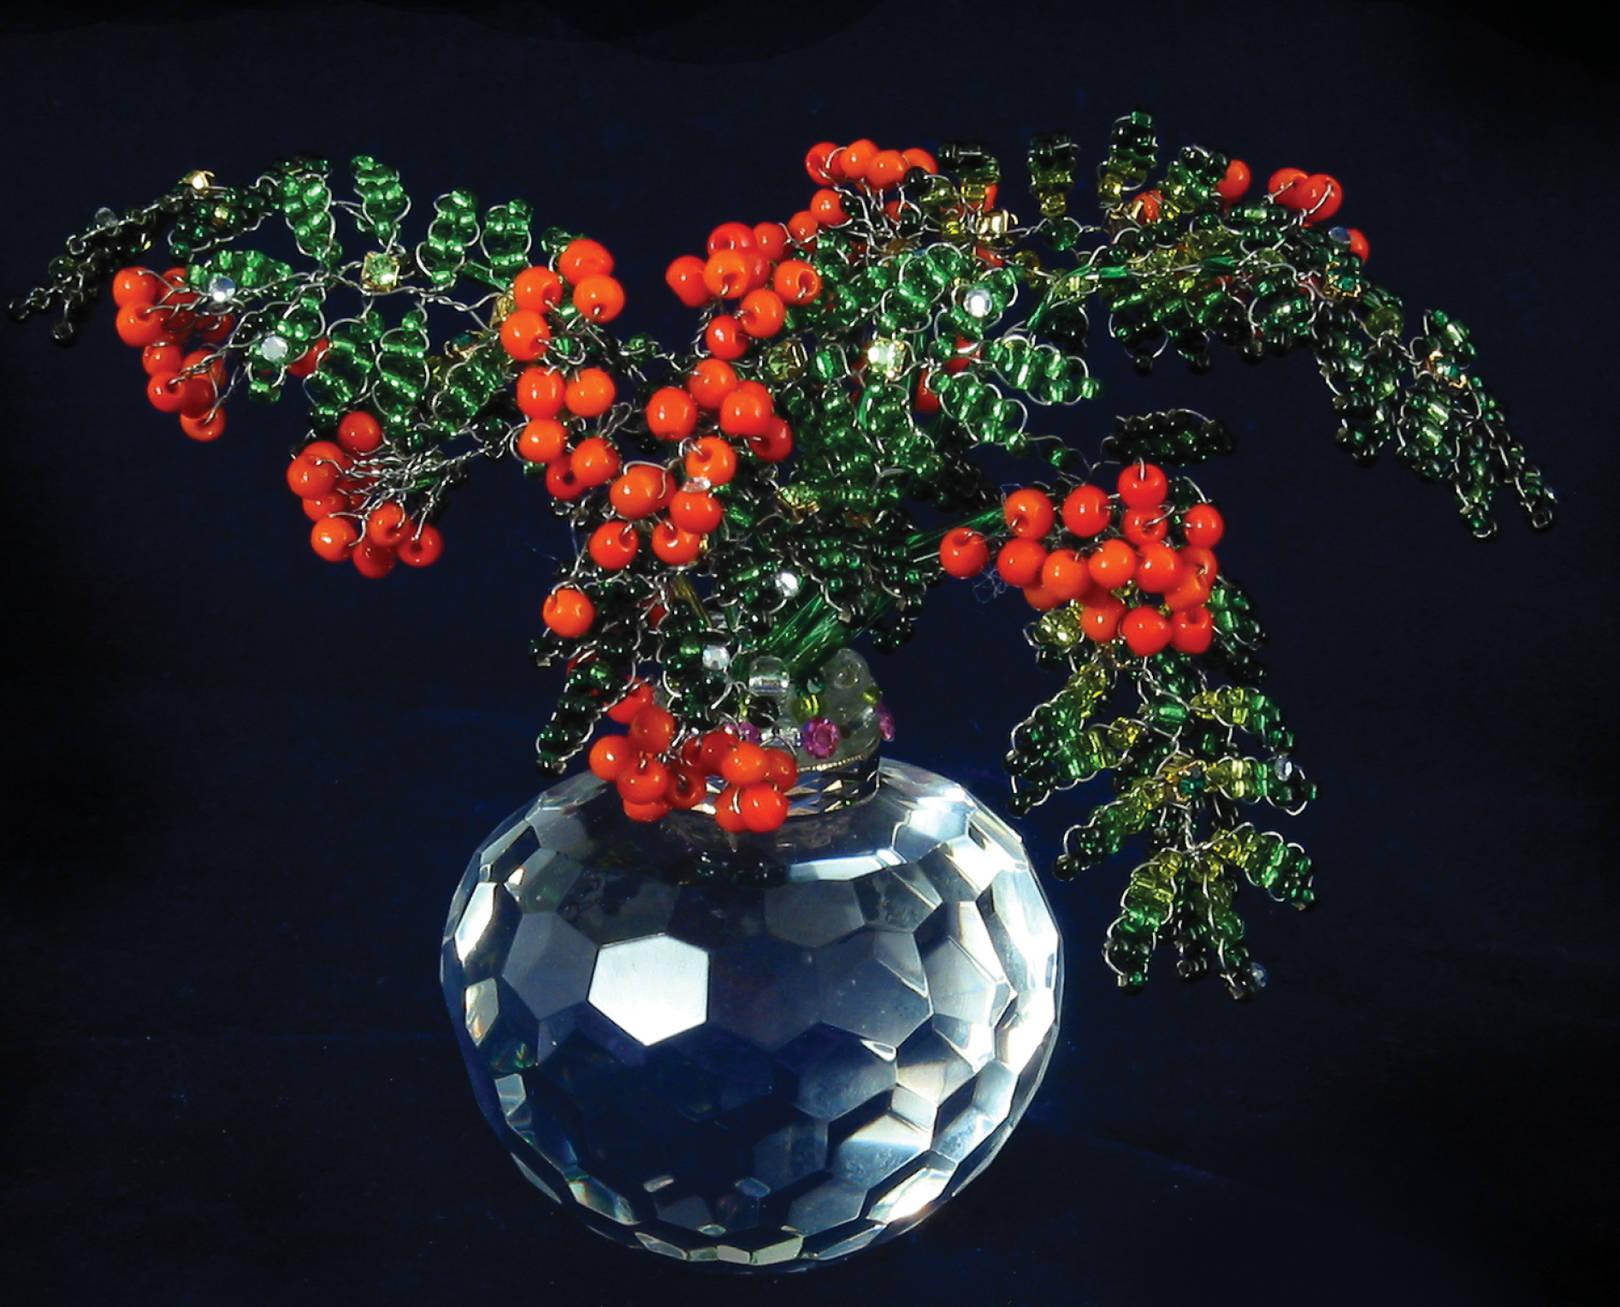 «THE SMILE OF ROWAN-TREE» Beads, glass, Swarovski crystals; 120 х 90 x 120 mm. Package: 150 mm (diameter), 130 mm (height).